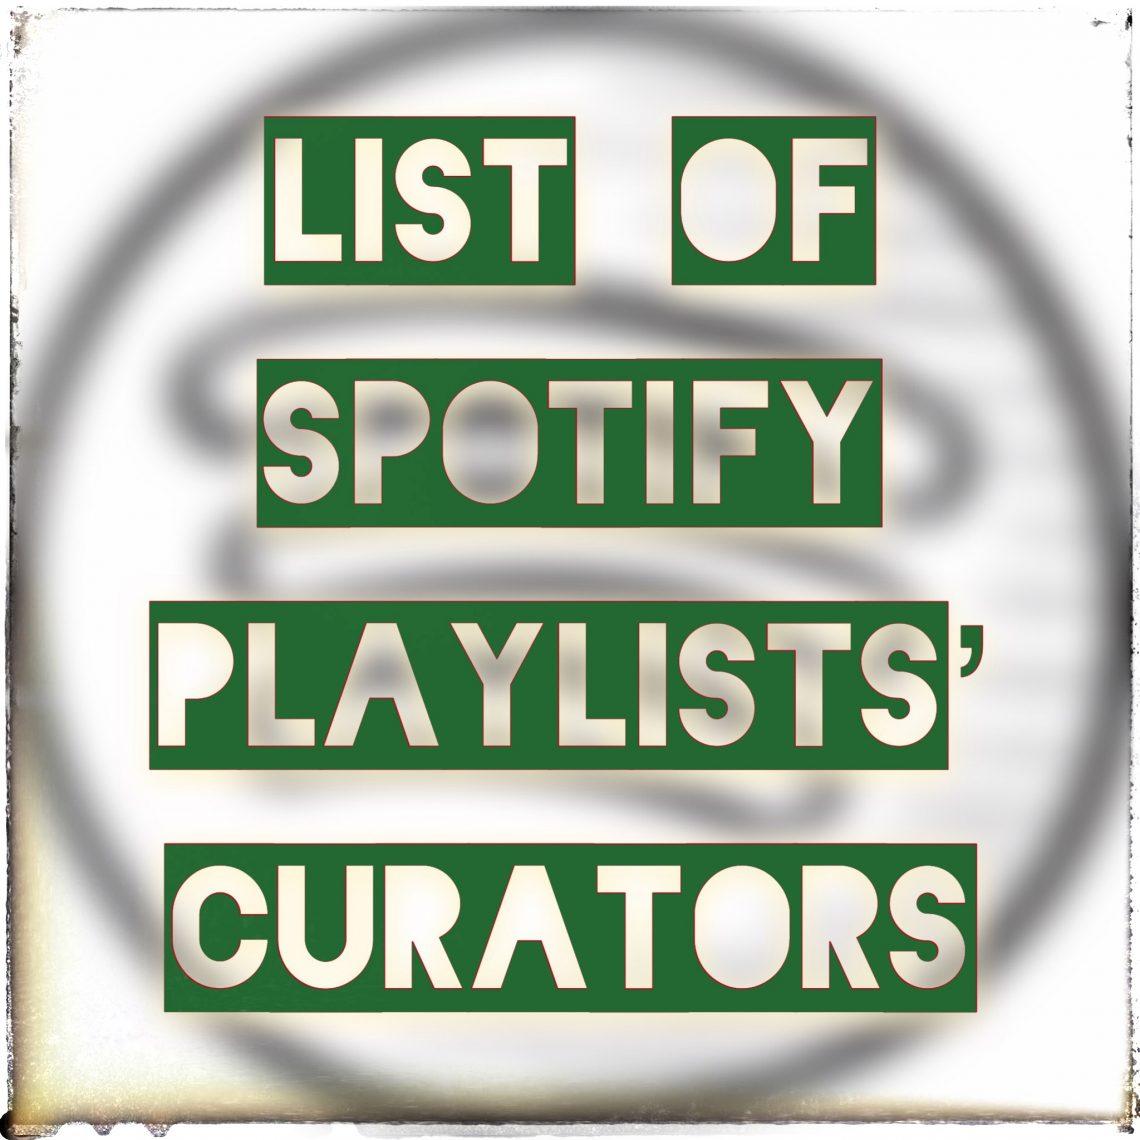 List of Spotify Playlist Curators